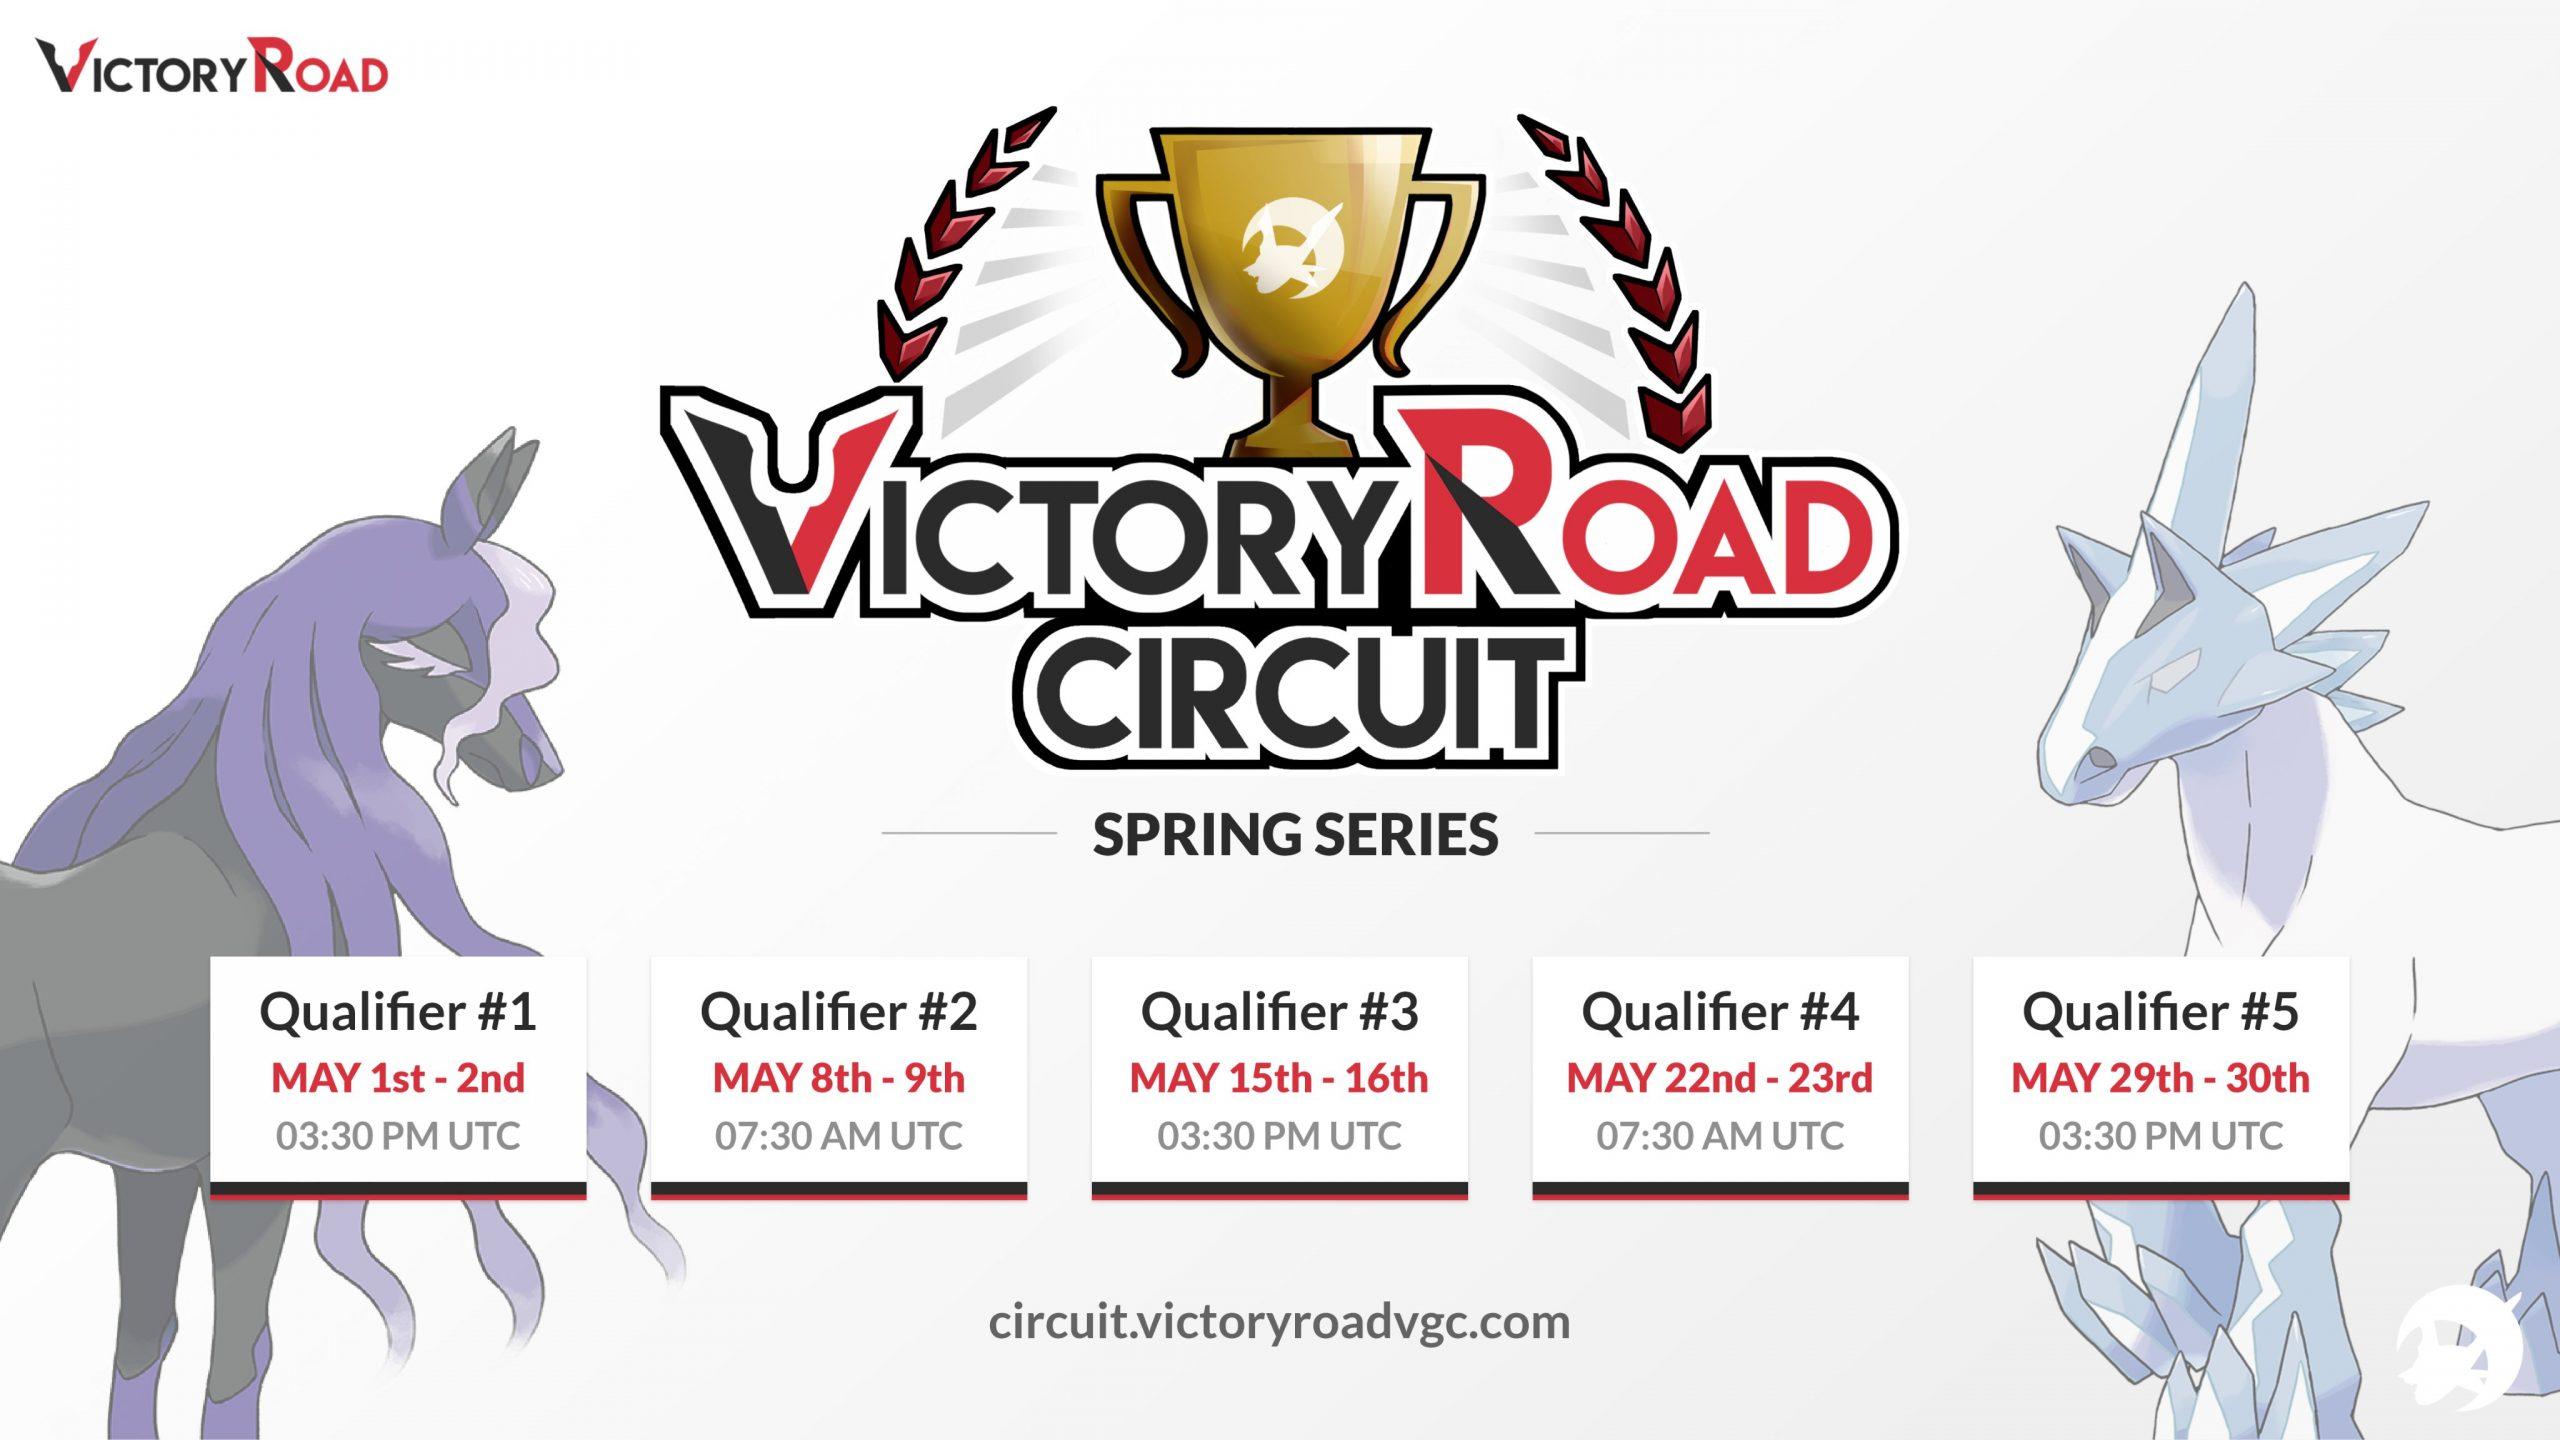 Victory Road Circuit Spring Series Clasificatorios